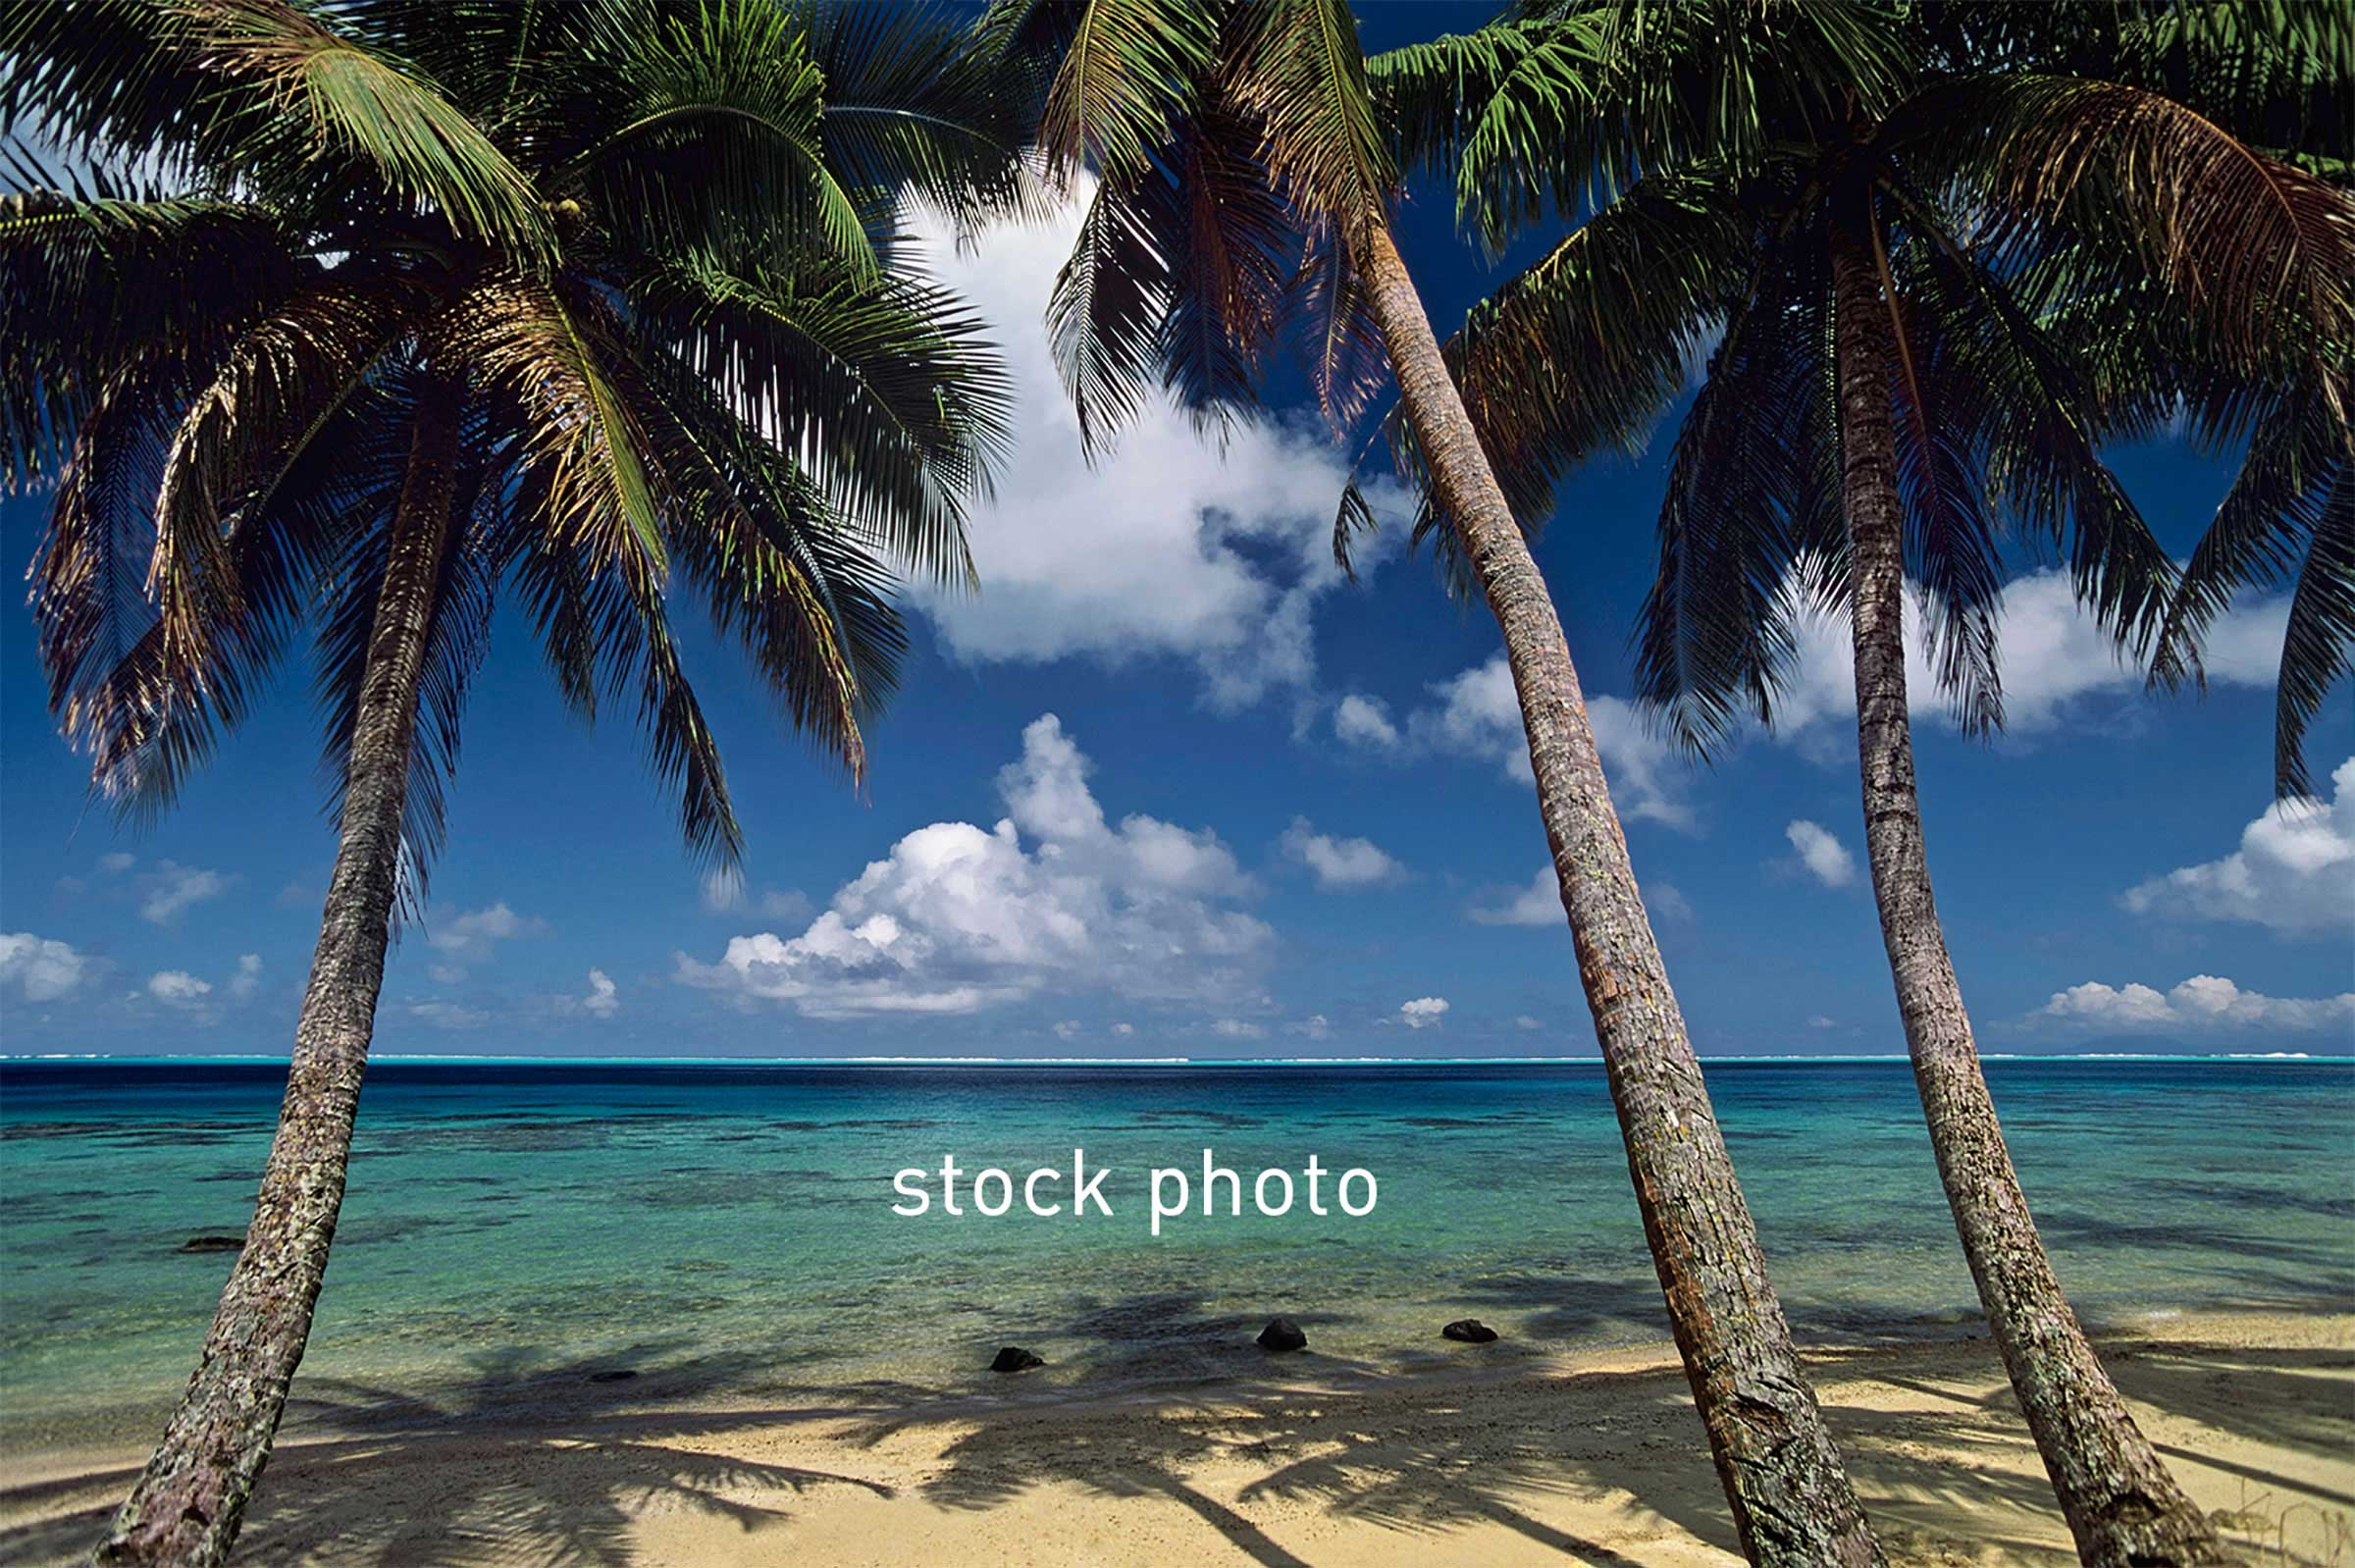 celebrity-caribbean-stock.jpg